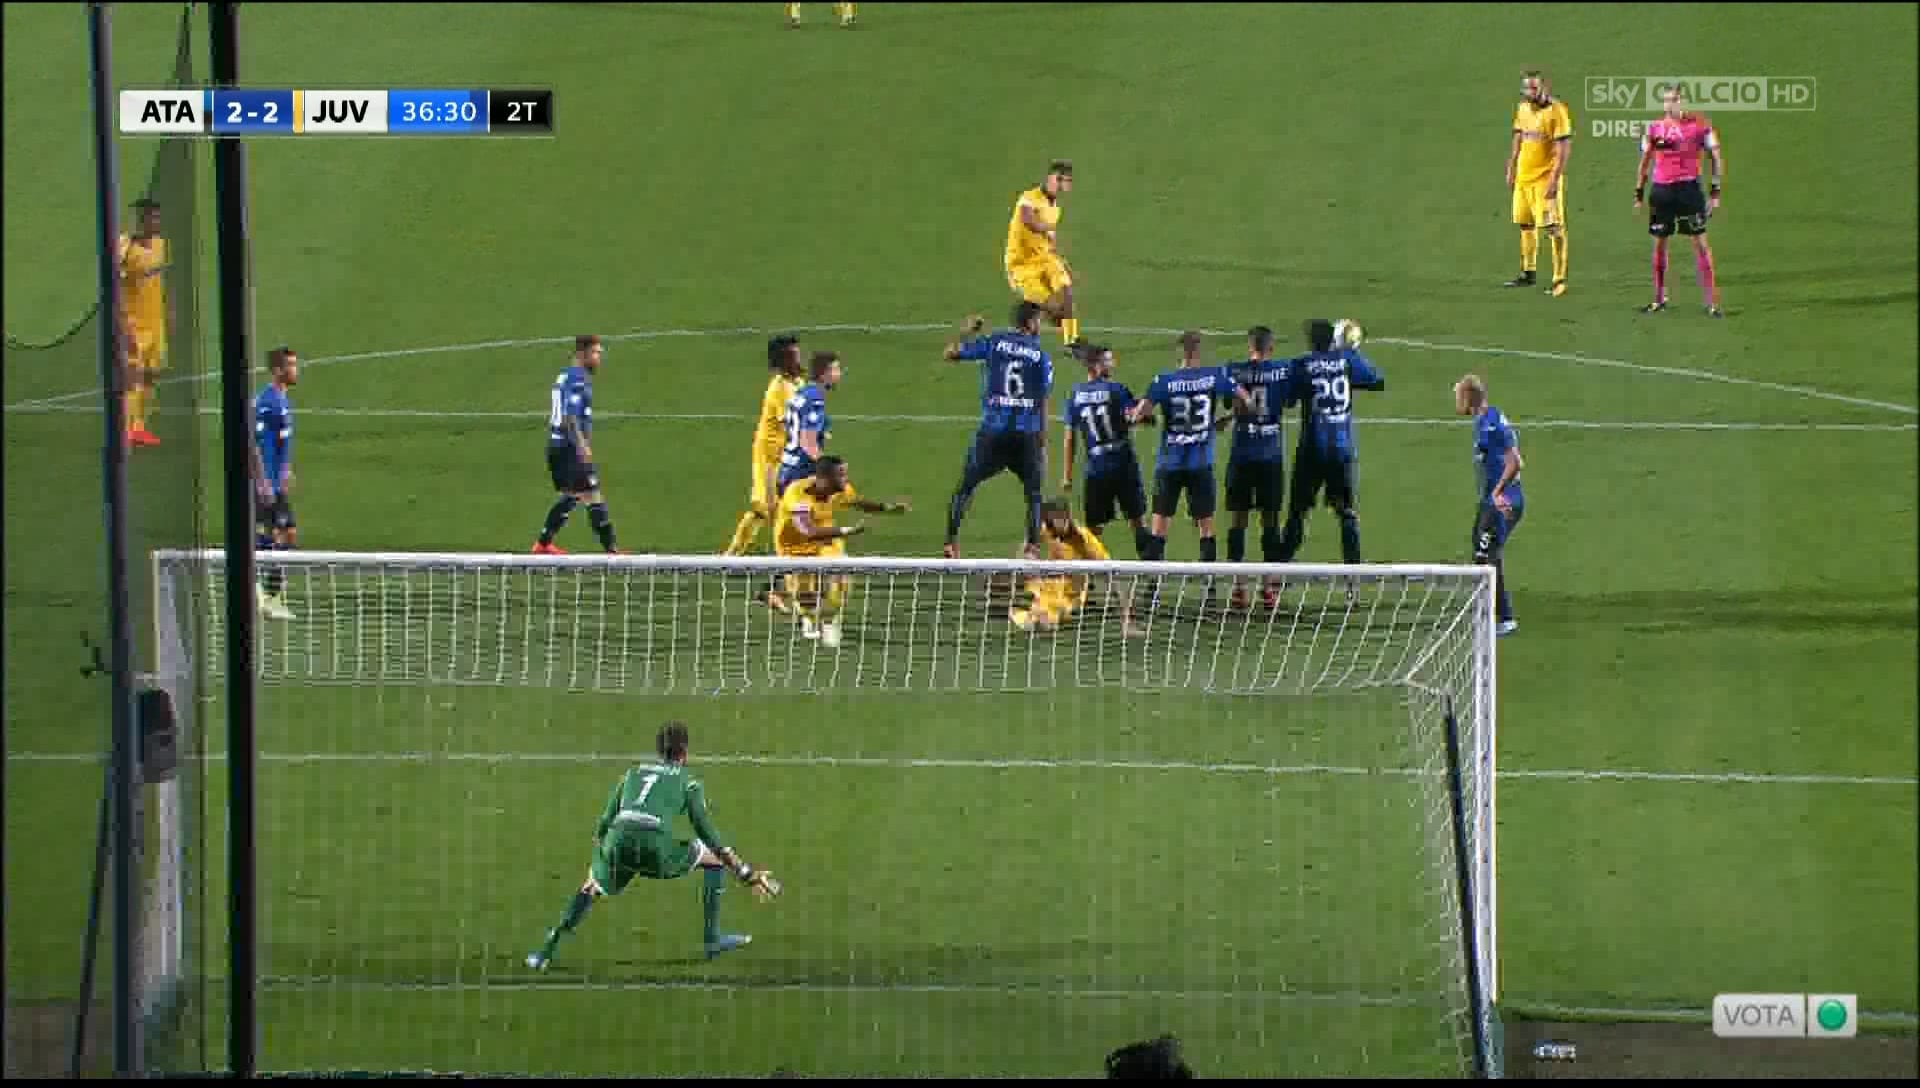 Atalanta-Juventus, Petagna la tocca in area: è rigore